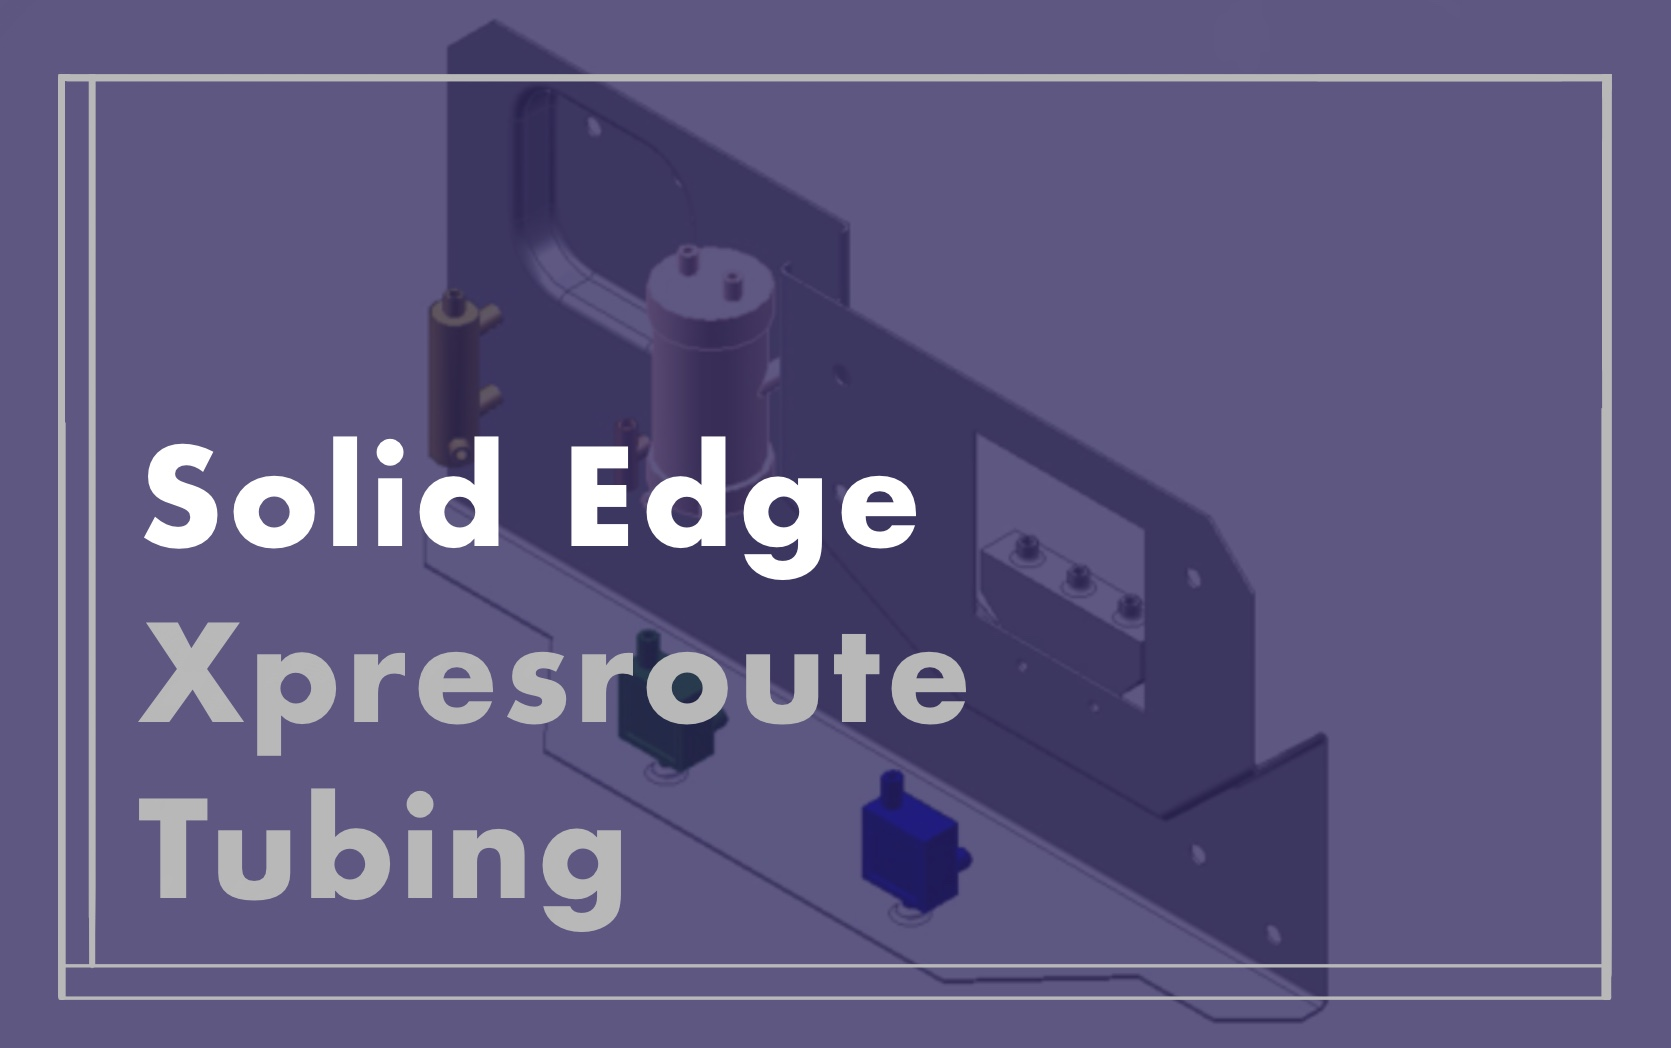 Solid Edge Xpresroute Tubing course image